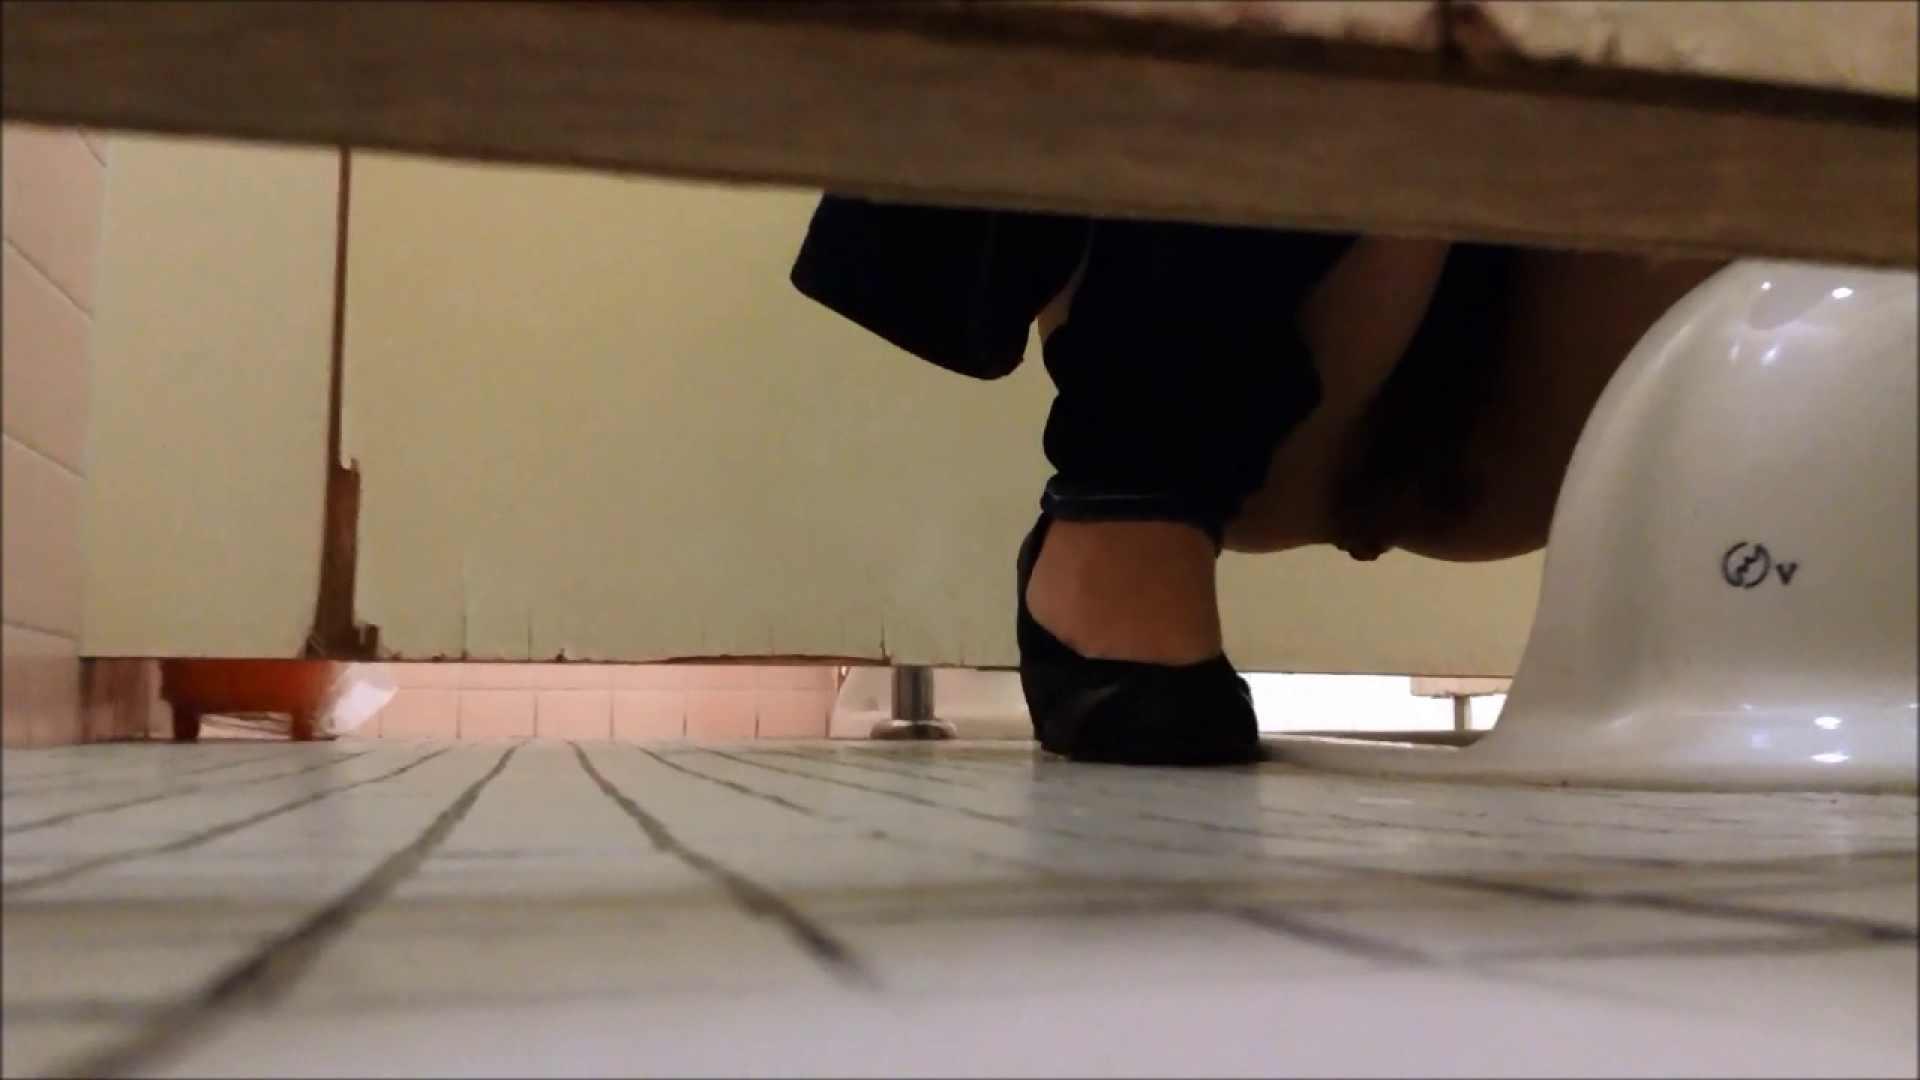 某有名大学女性洗面所 vol.06 和式 | 潜入 のぞき 80PIX 67